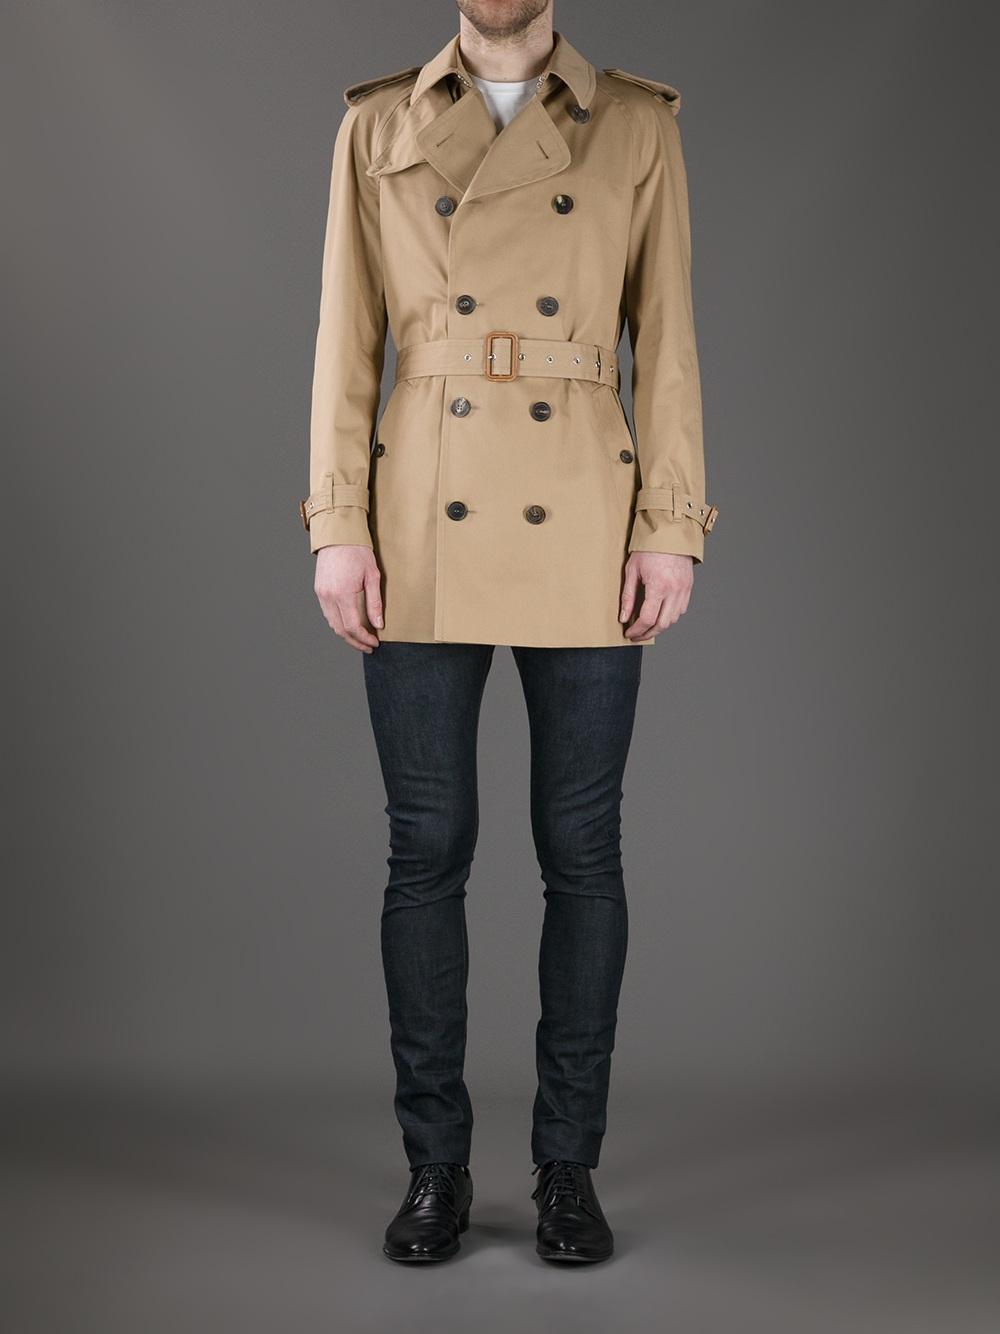 76e26314ac Saint Laurent Brown Short Trench Coat for men